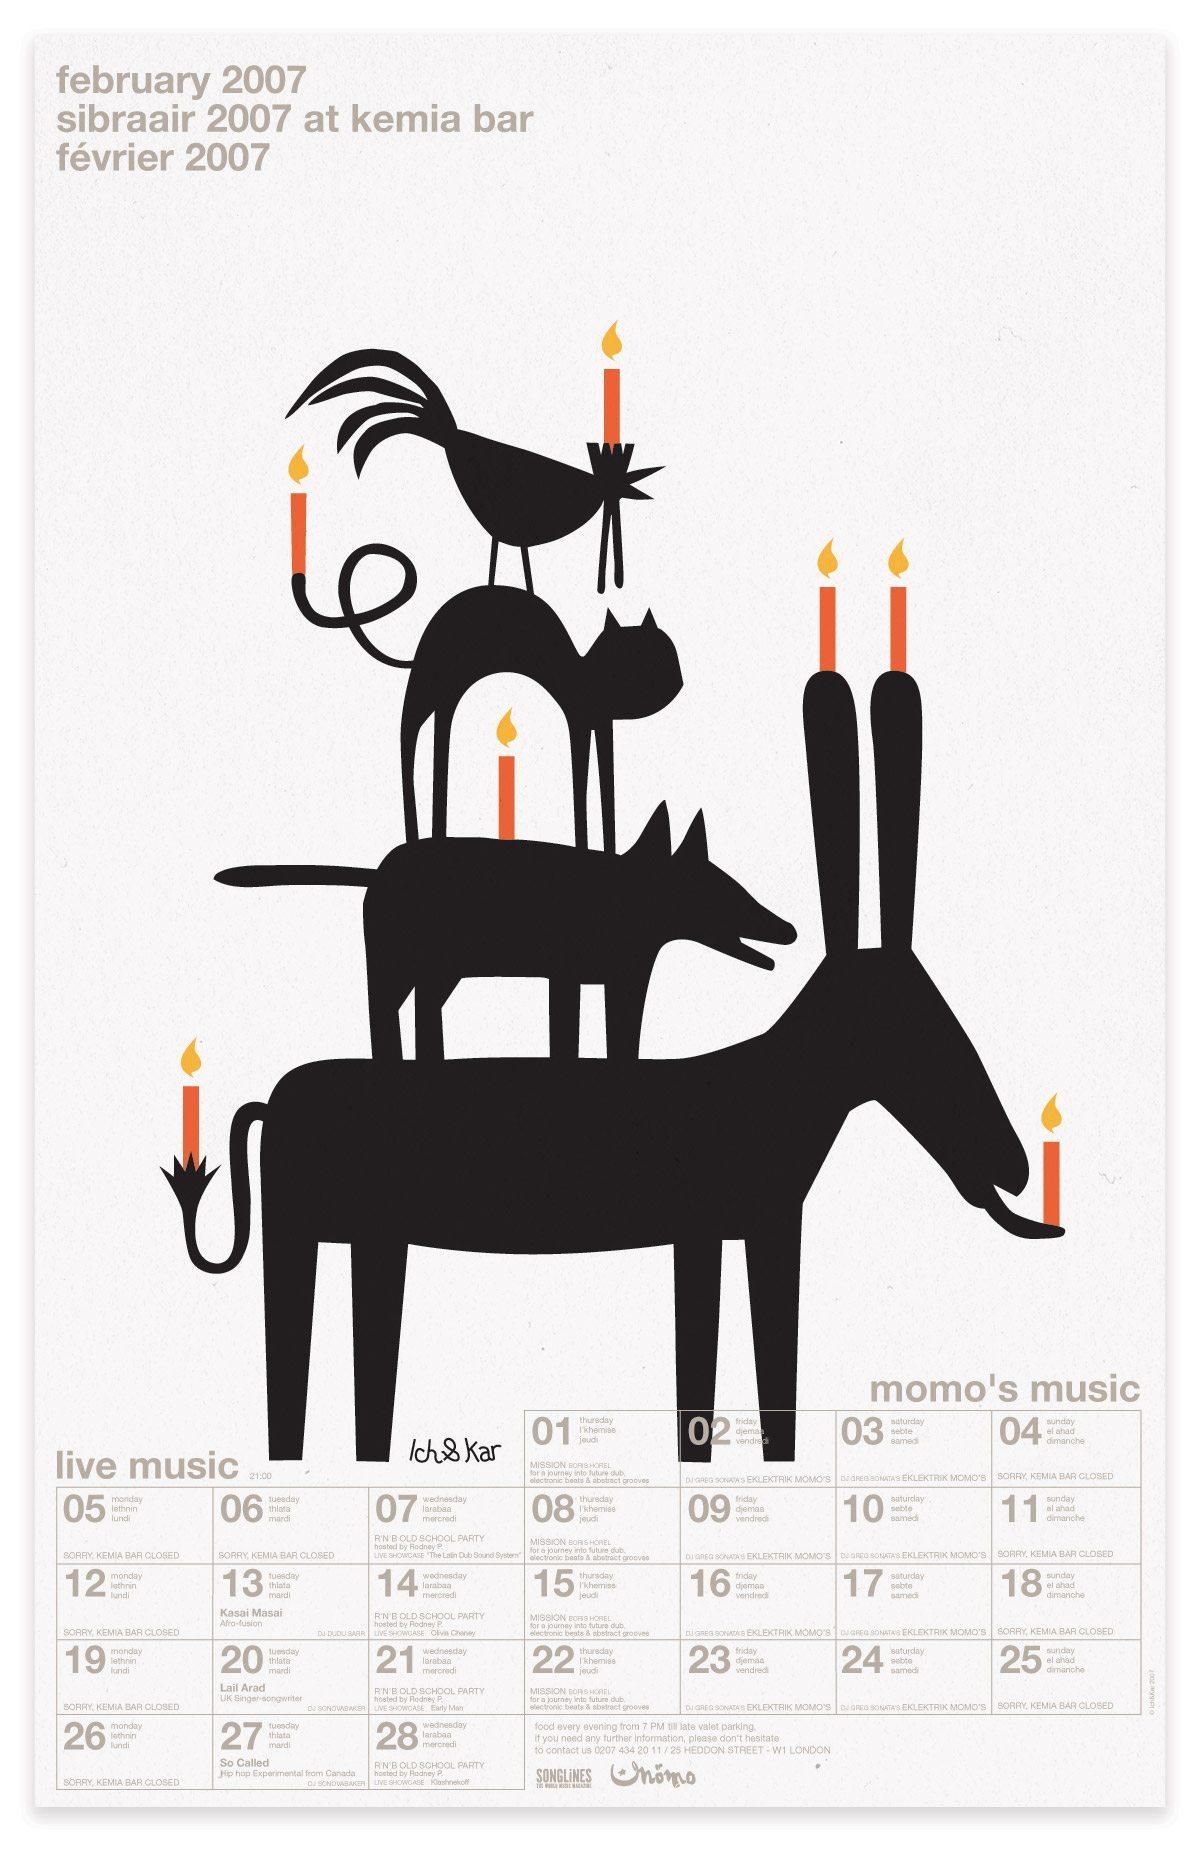 ichetkar diary at momo animaux brême calendrier